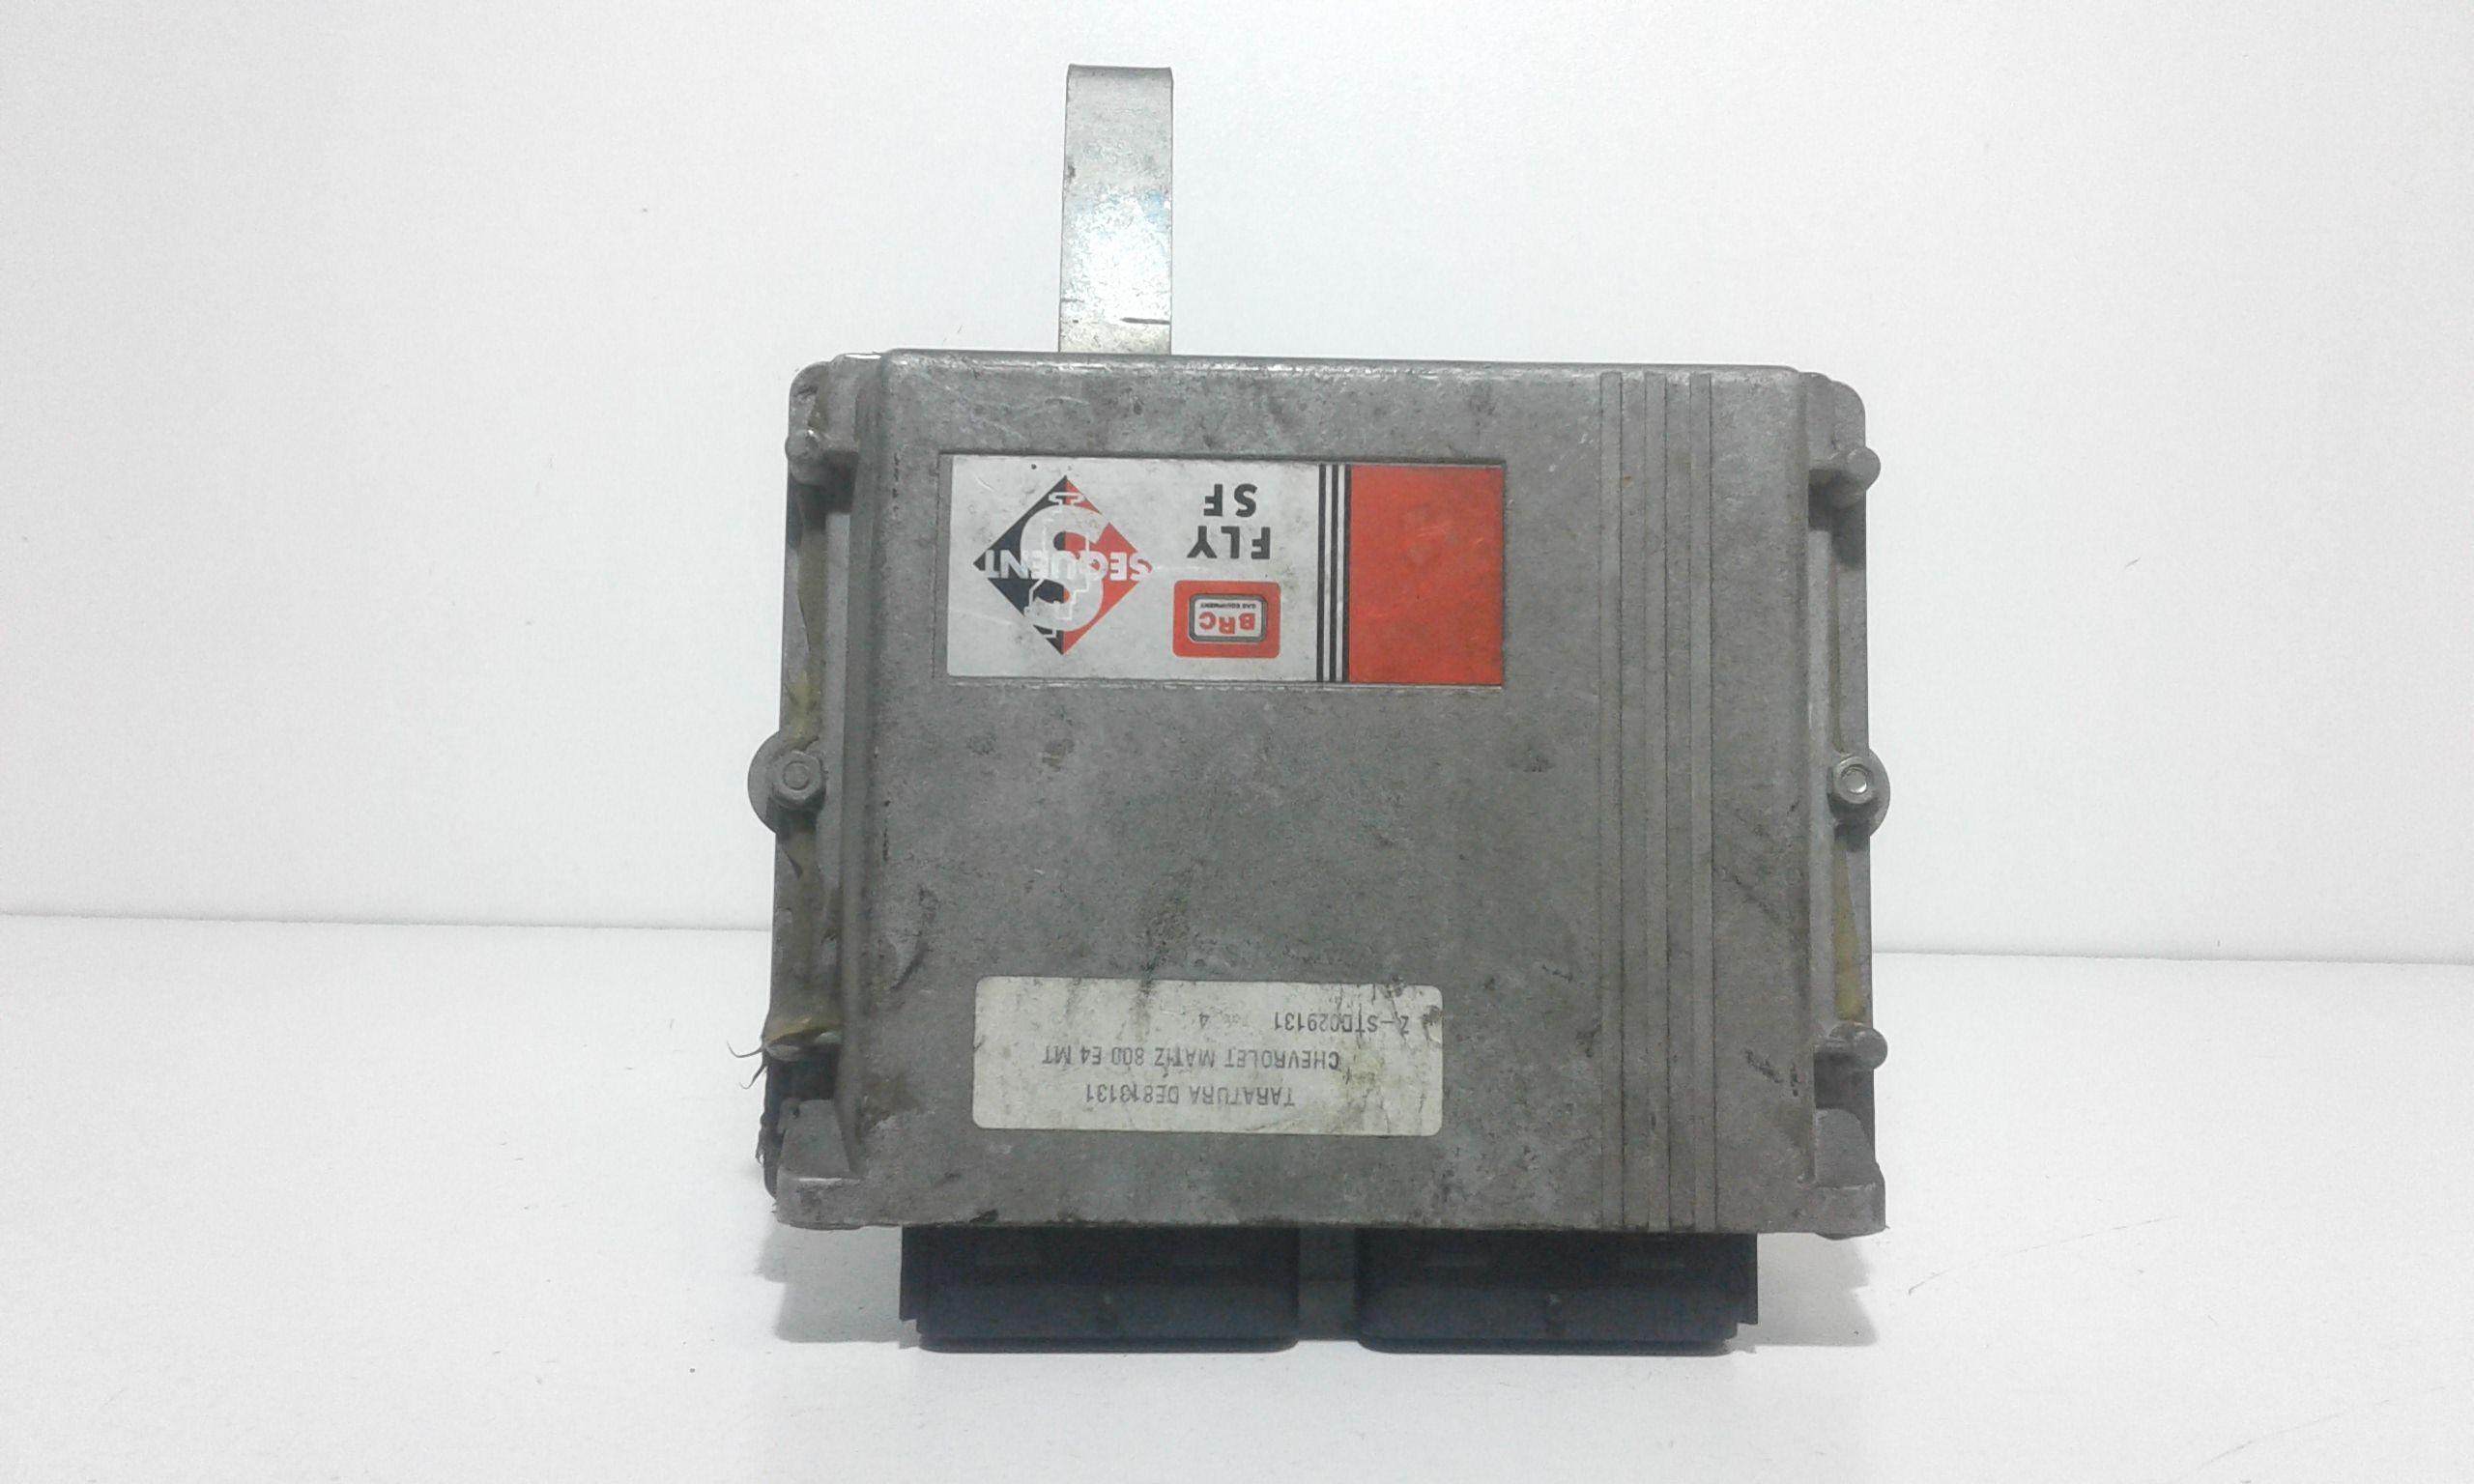 DE813131 CENTRALINA GPL CHEVROLET Matiz 4° Serie 800 Benzina    (2009) RICAMBI USATI